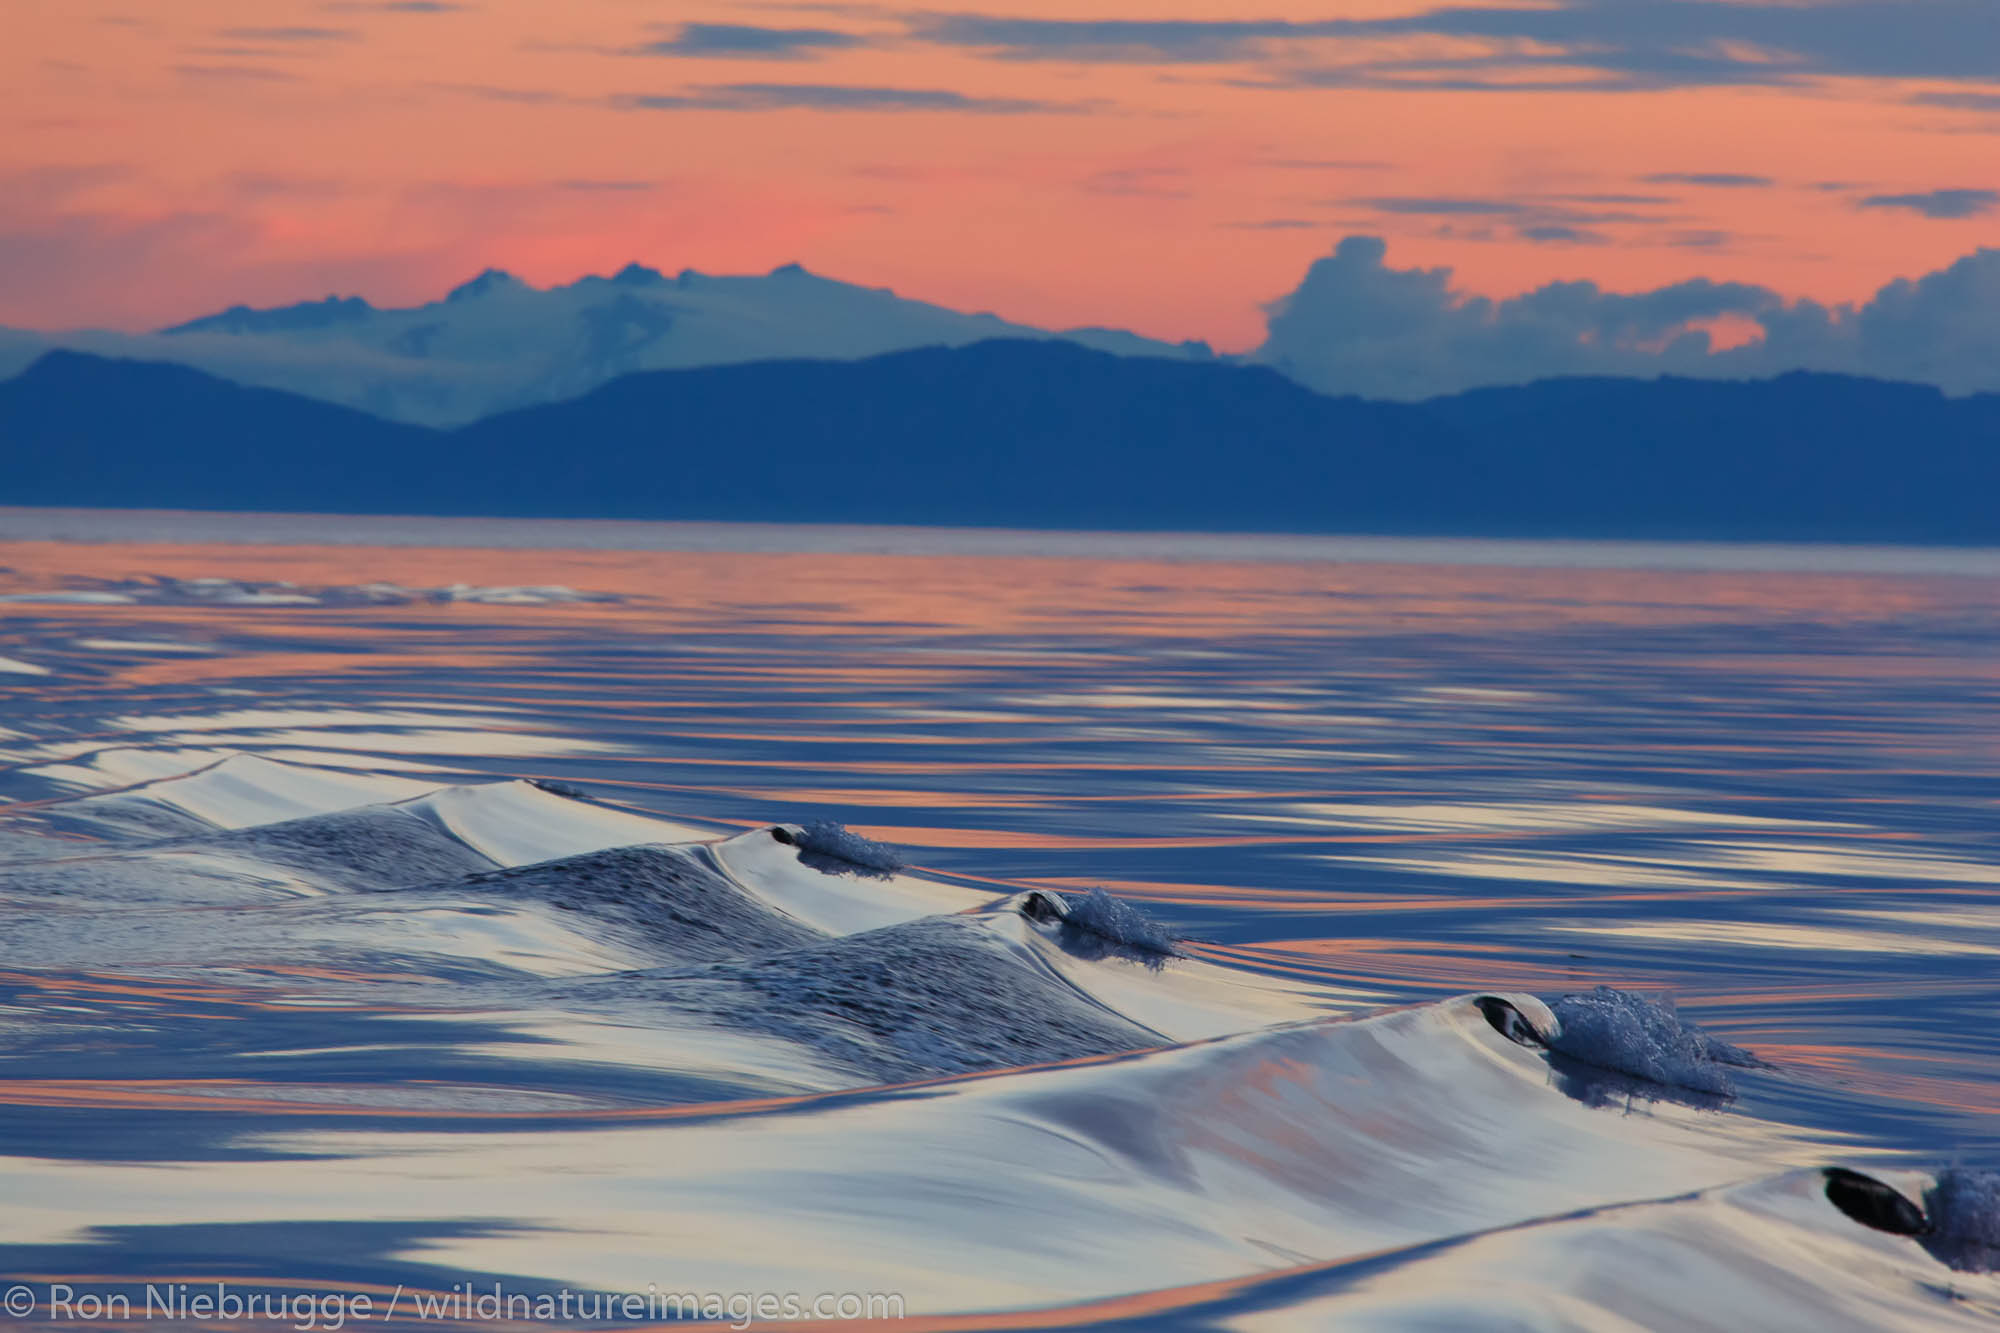 Sunset, Cape Fanshaw, Tongass National Forest, Alaska.